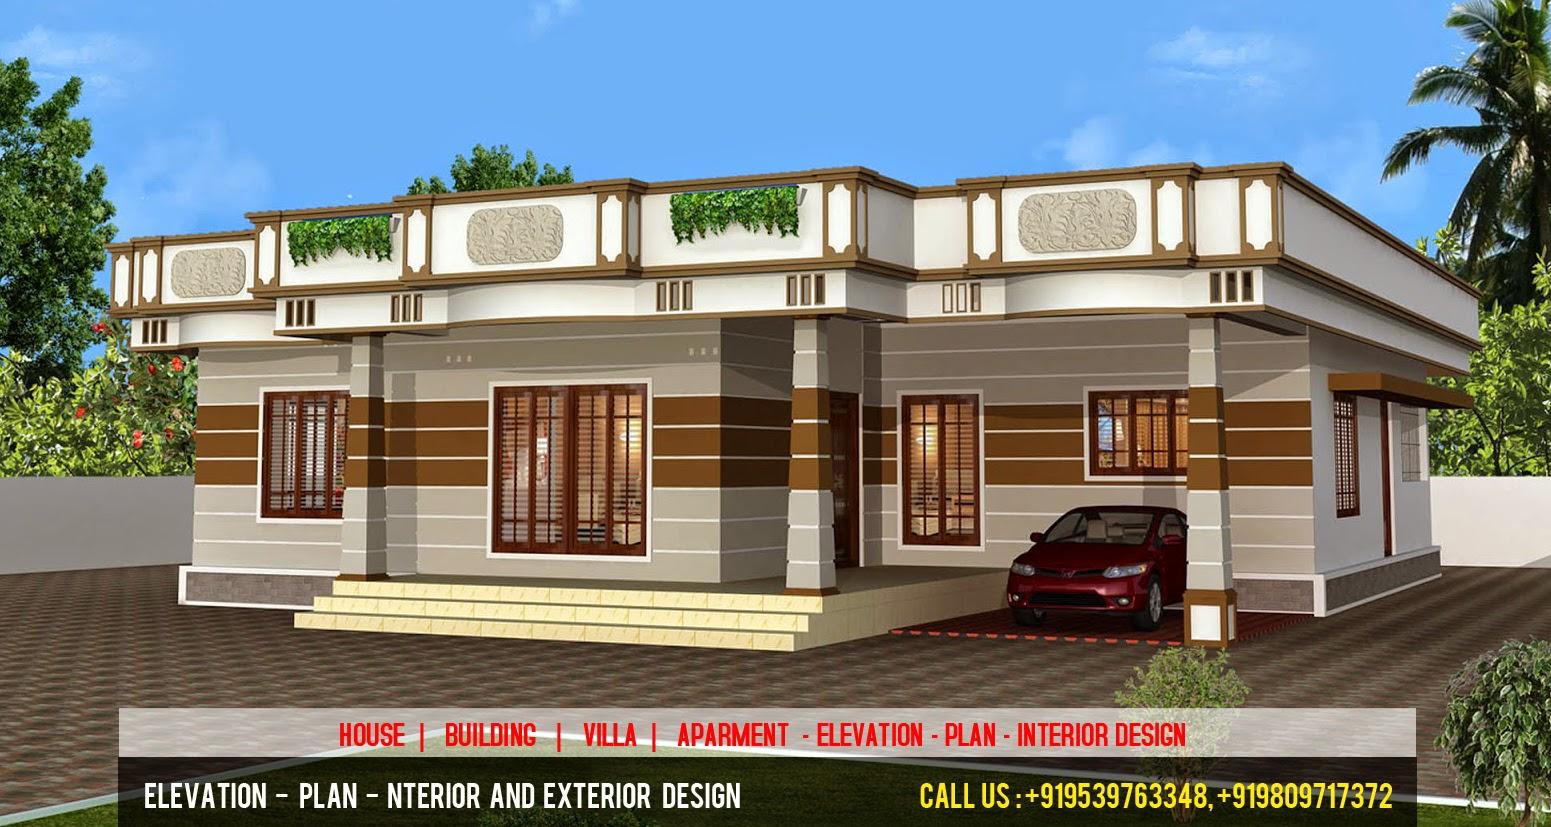 Exterior Elevation Plan : D elevation plan designer front cochin